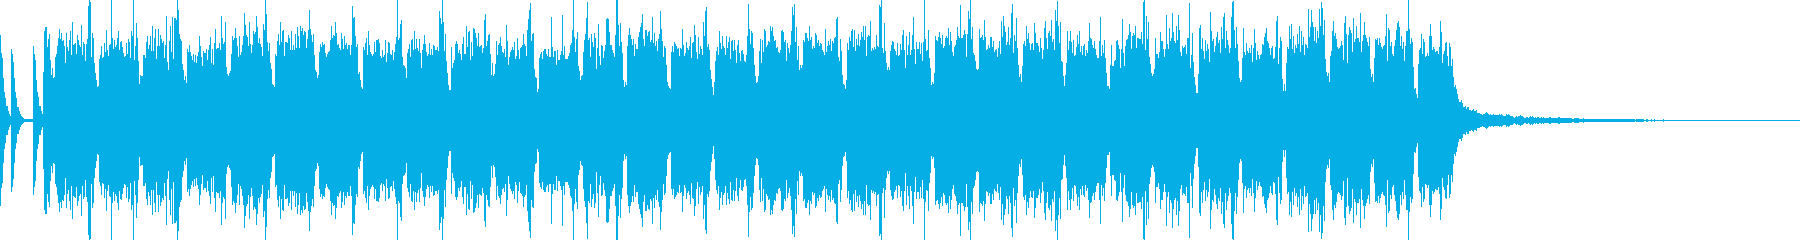 Synthwave CMの再生済みの波形